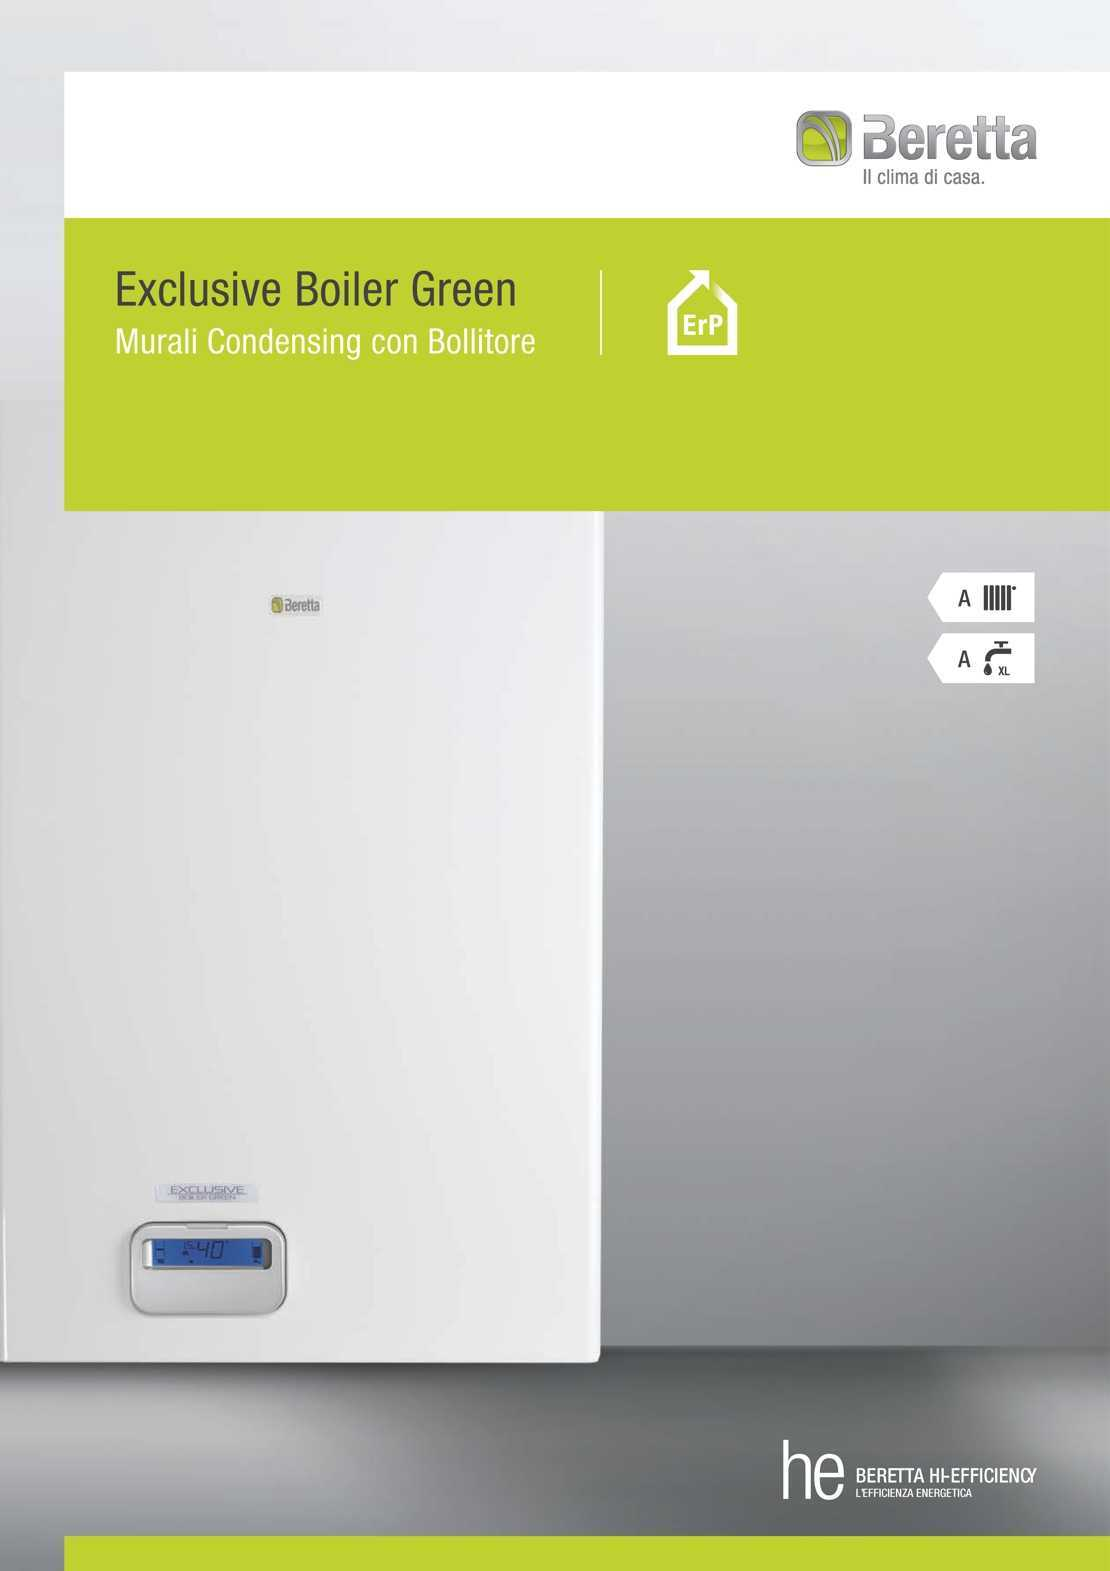 Caldaia Beretta Exclusive Boiler Green HE erp